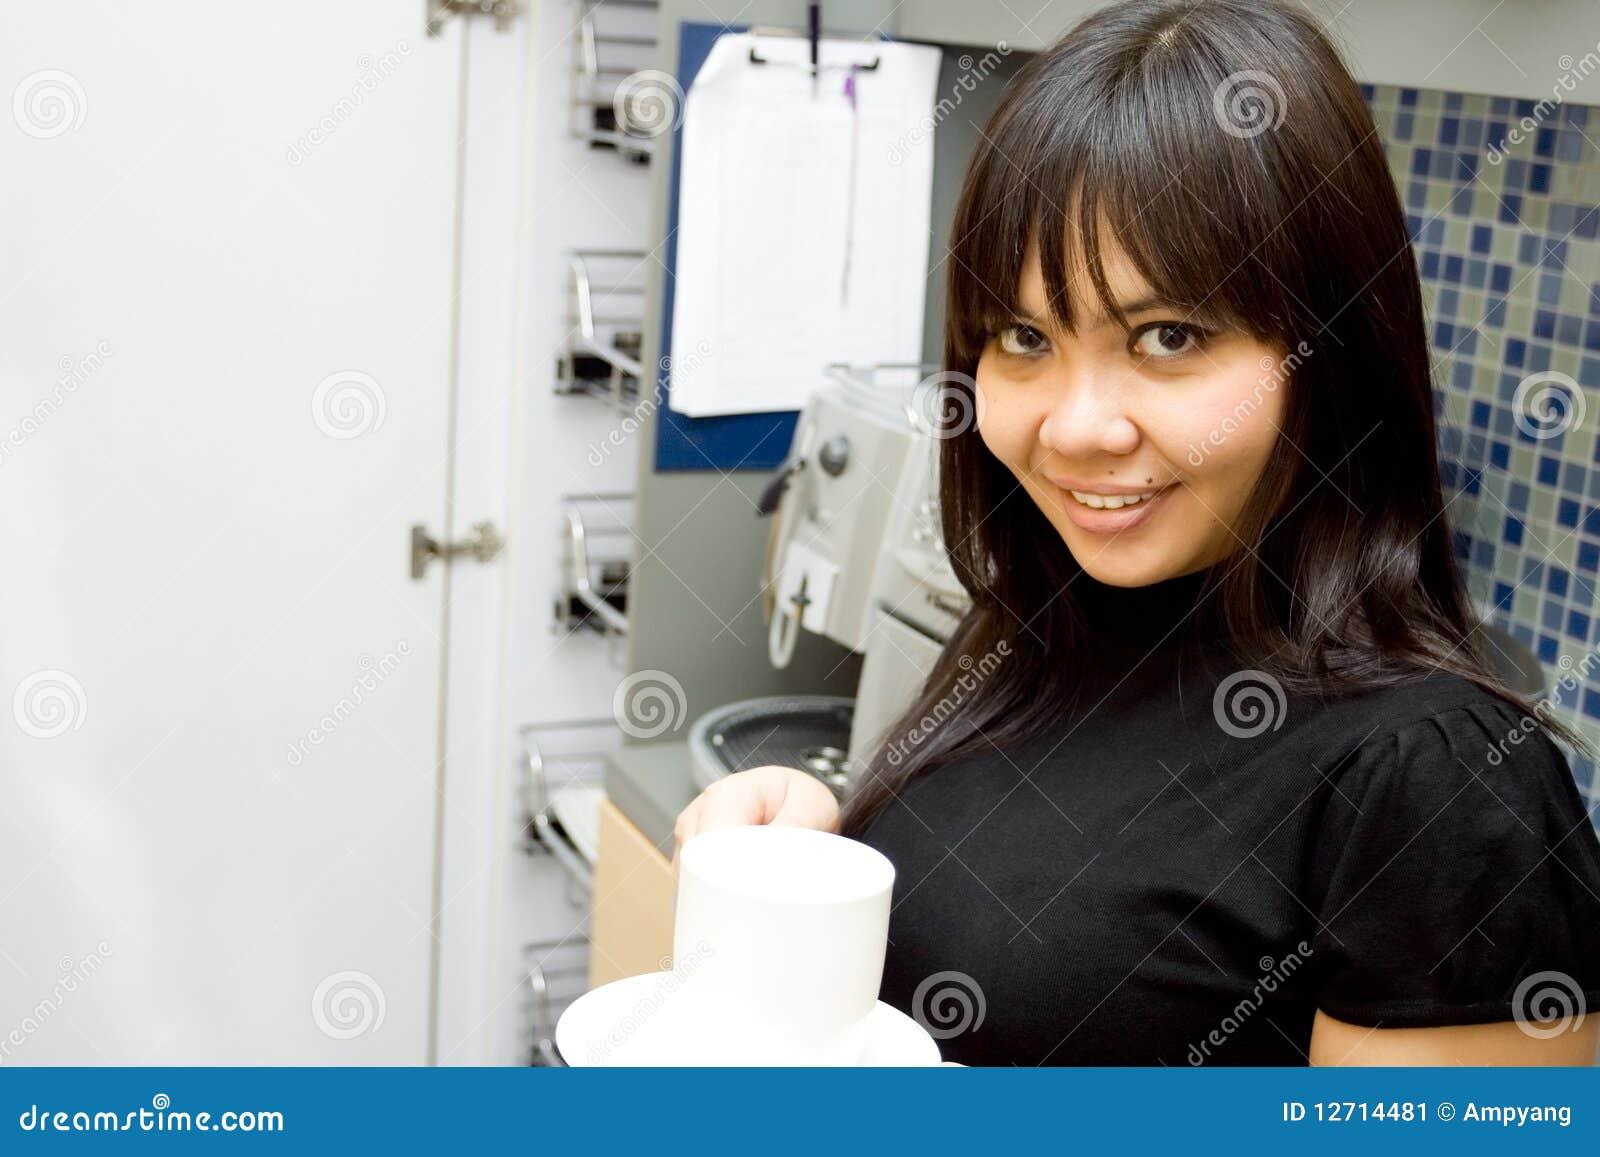 Take Break Coffeebreak : Business woman take coffee break stock image image of happy